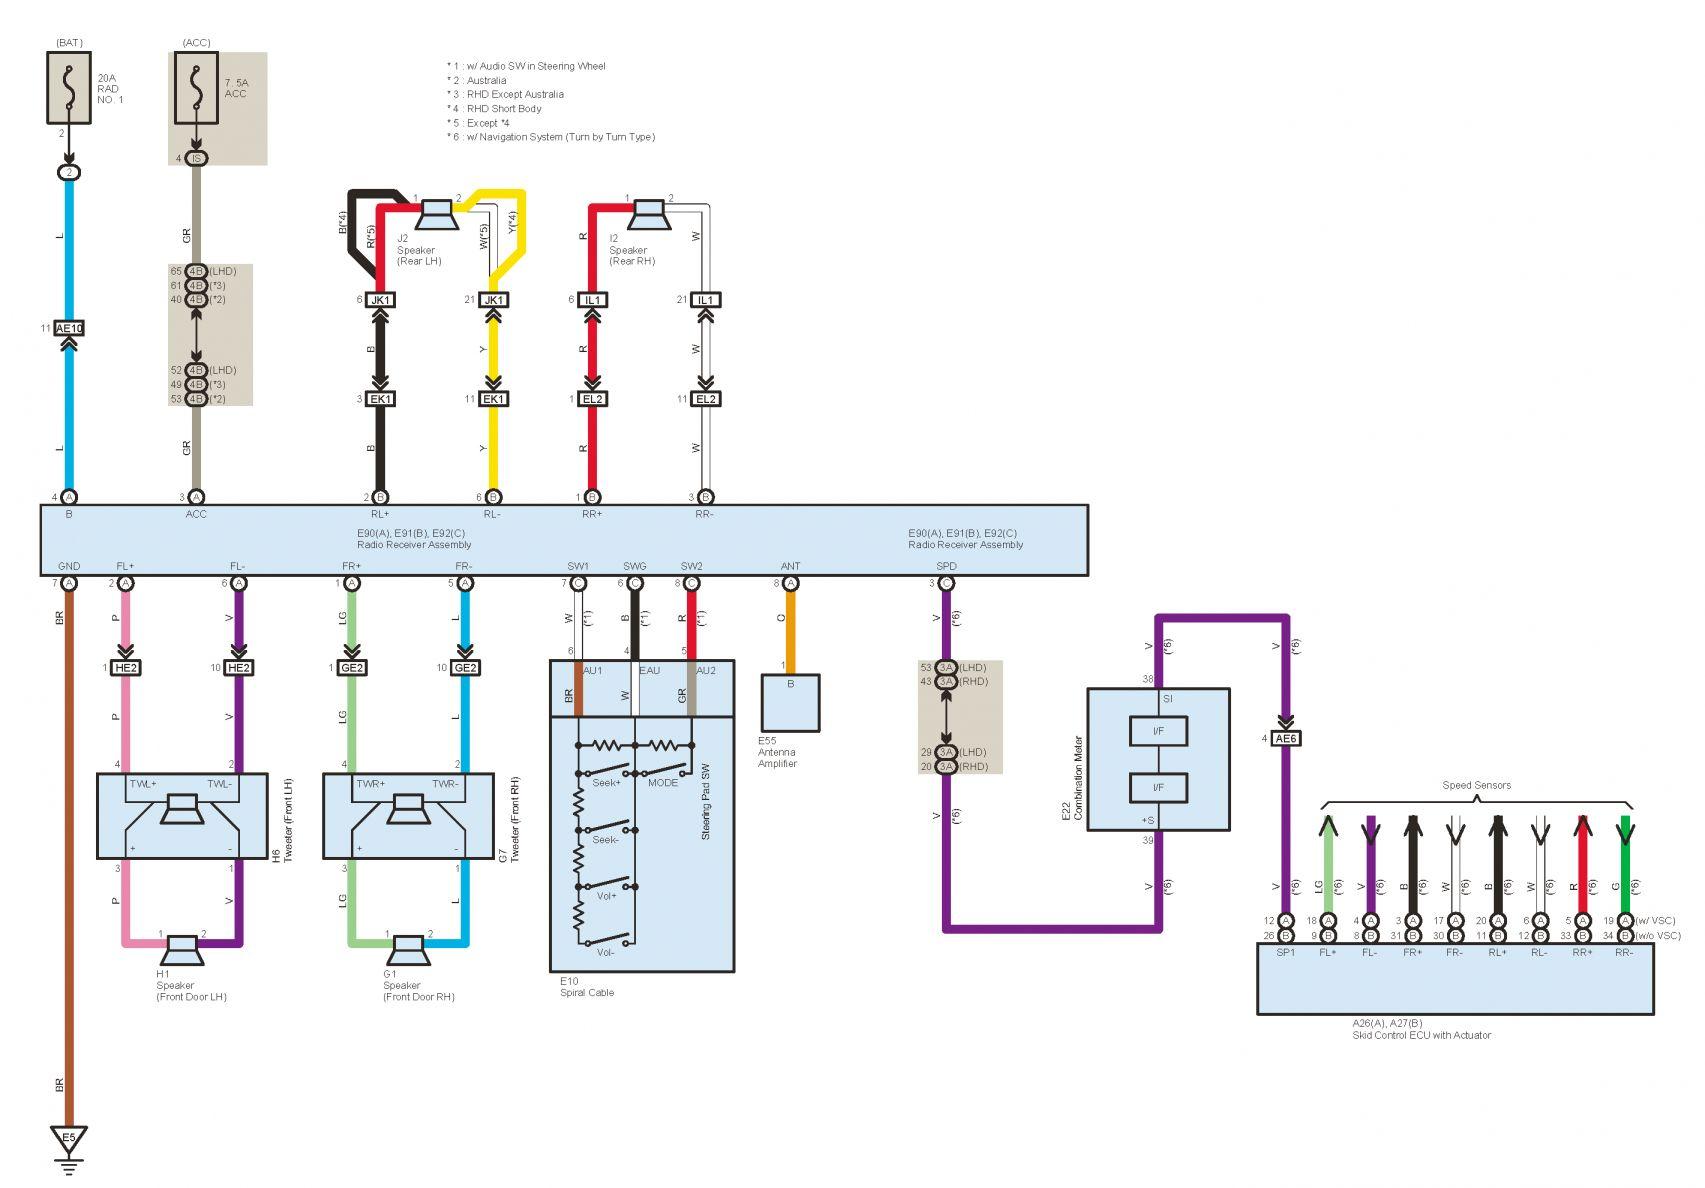 18+ 2012 camry electrical wiring diagram - wiring diagram - wiringg.net |  electrical wiring diagram, electrical wiring, electrical diagram  pinterest